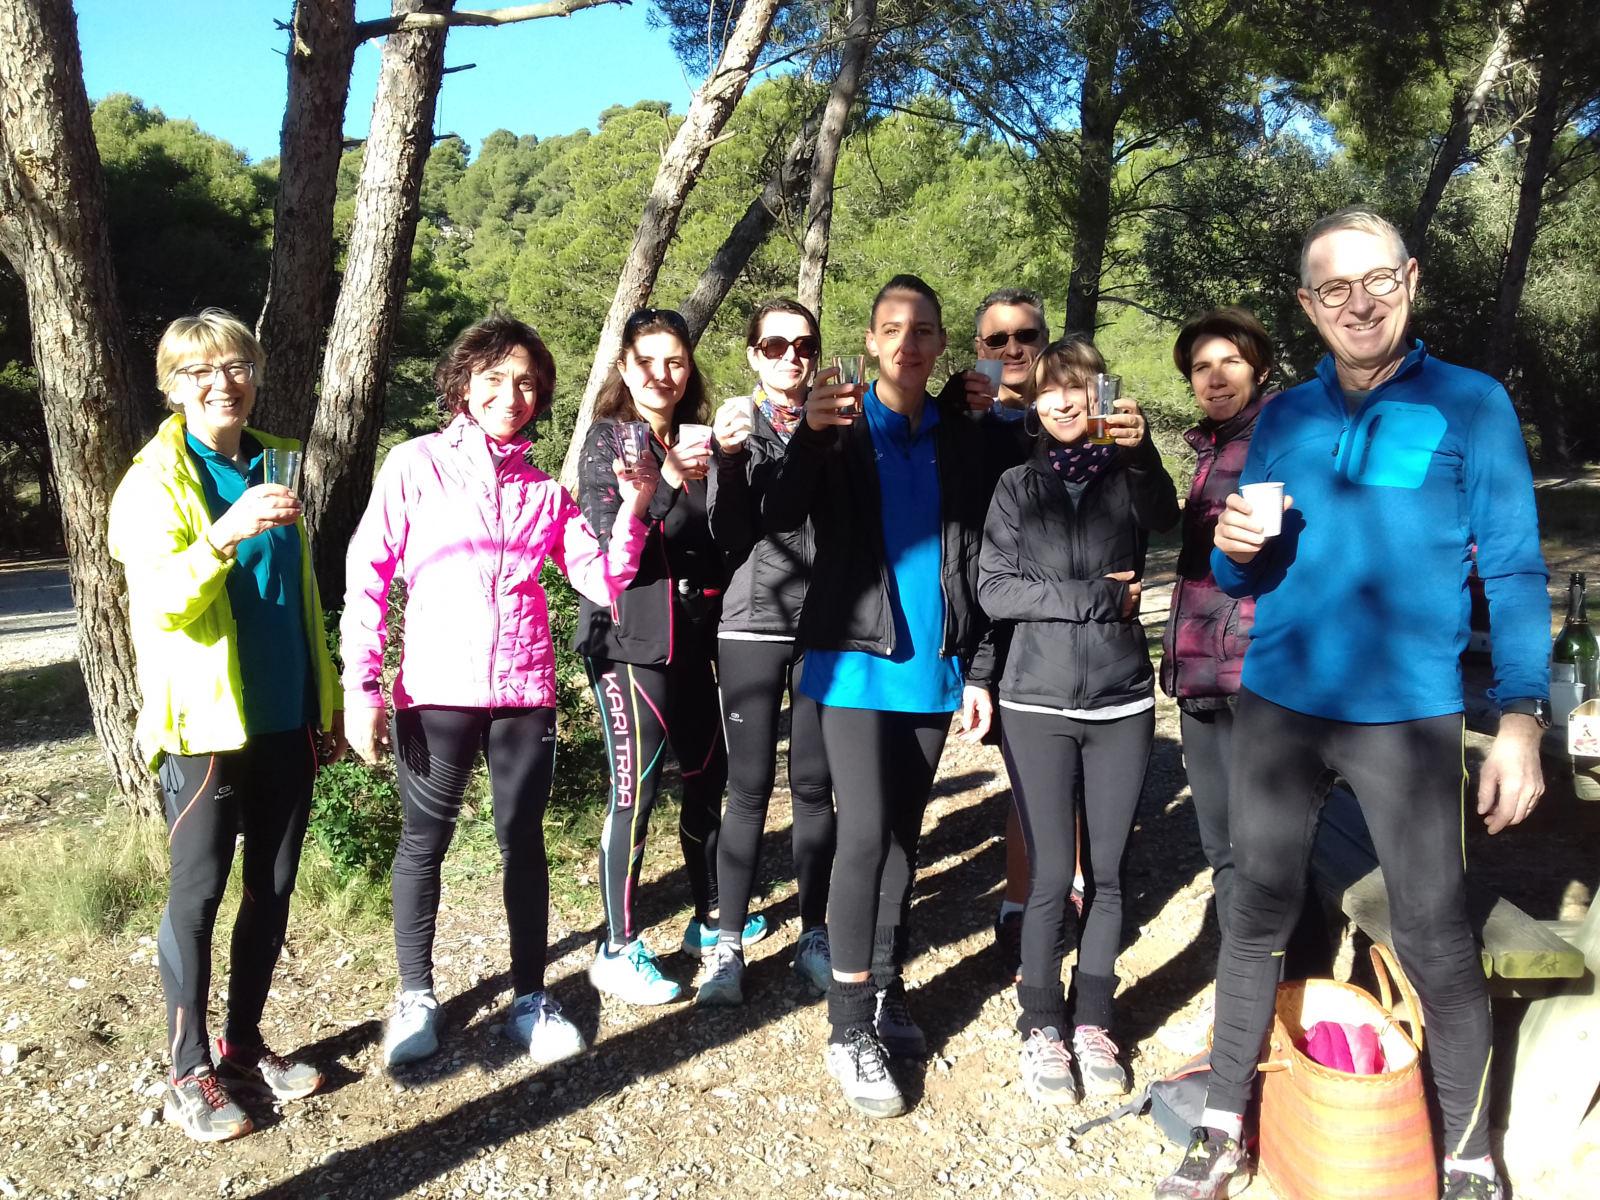 ACAD - Activités Sportives Apéritif de noël (MNS)